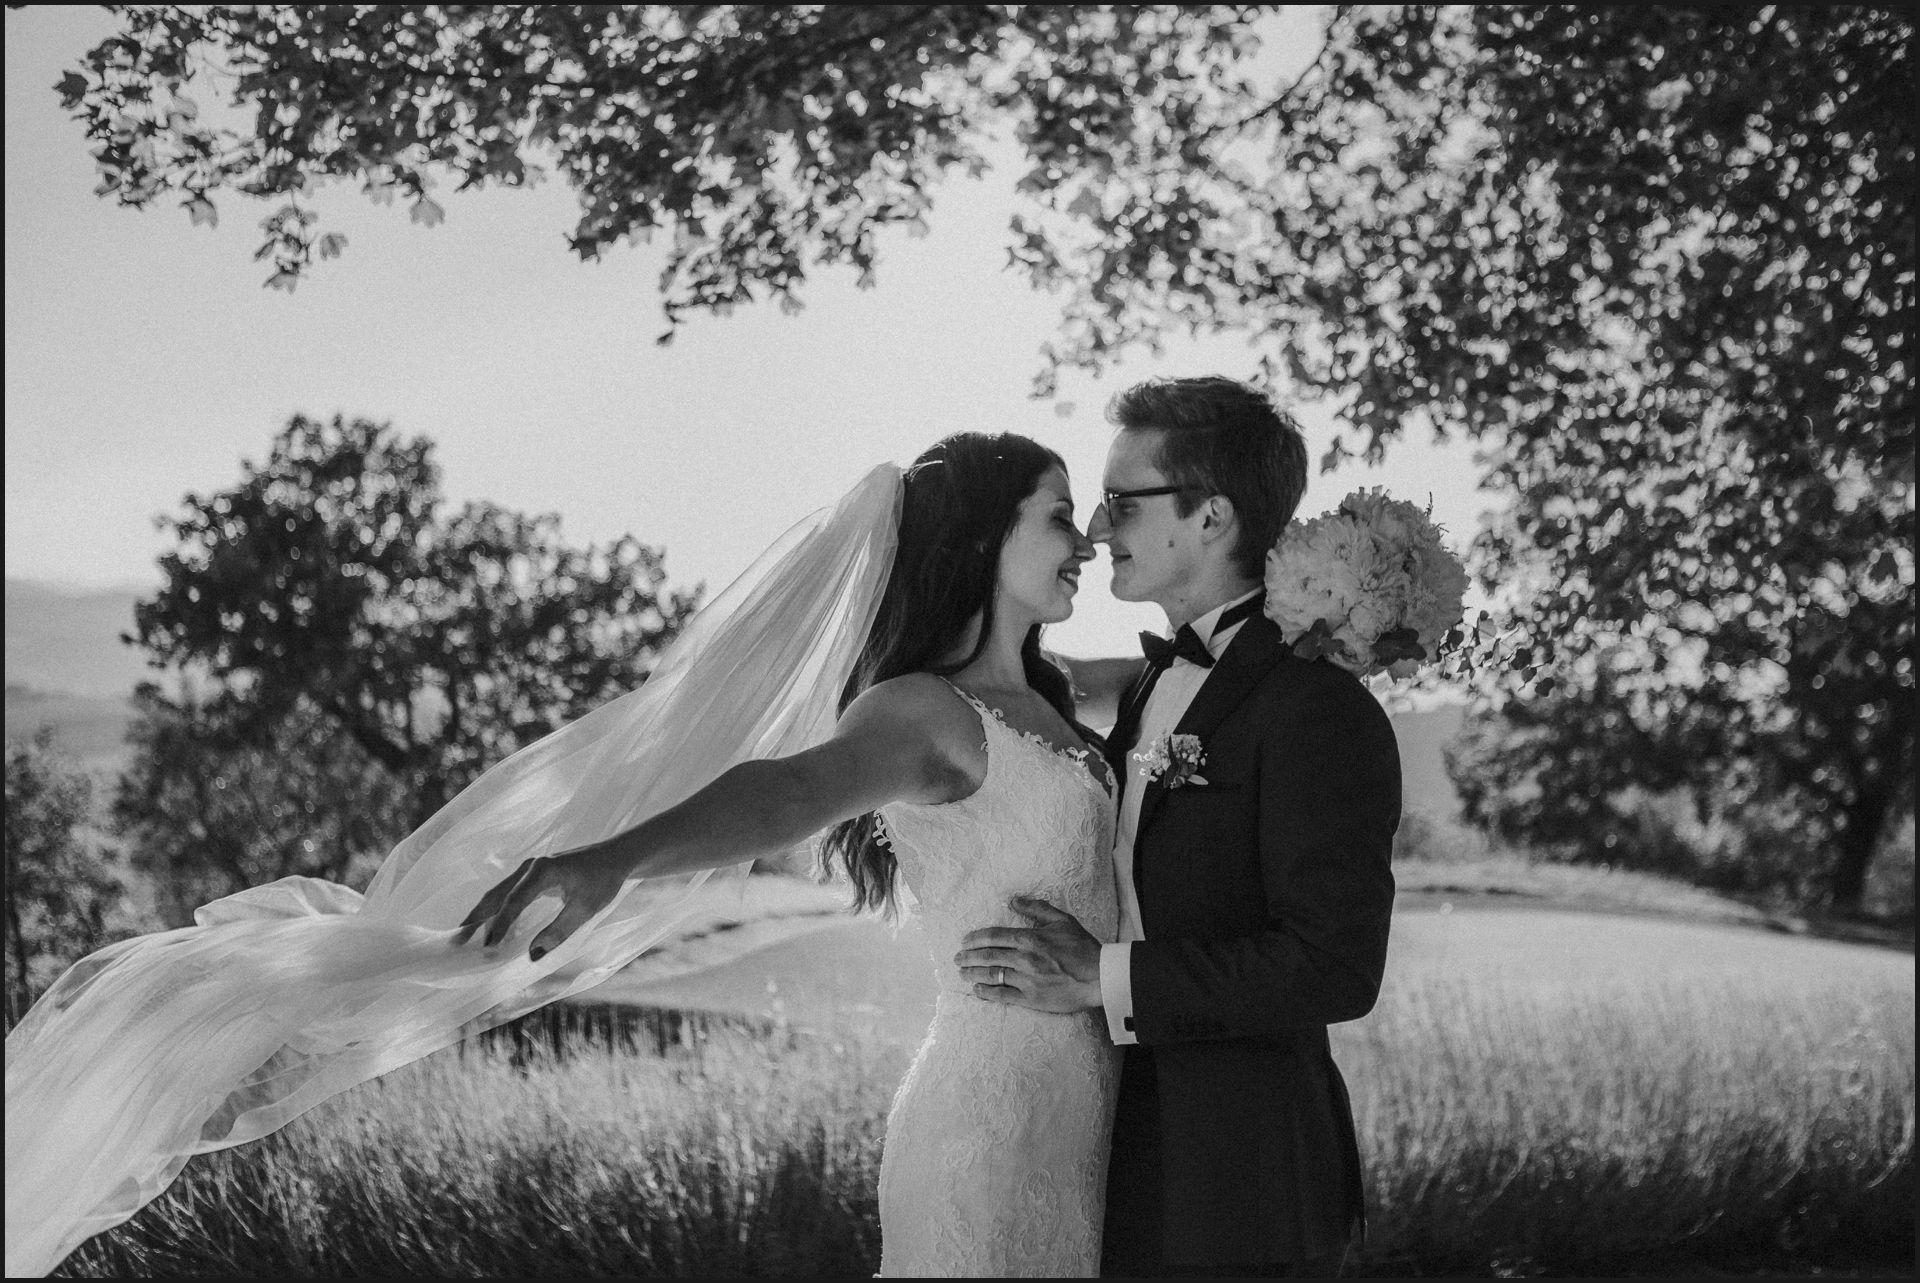 black and white, wedding, umbria, nikis resort, bride, groom, veil, love